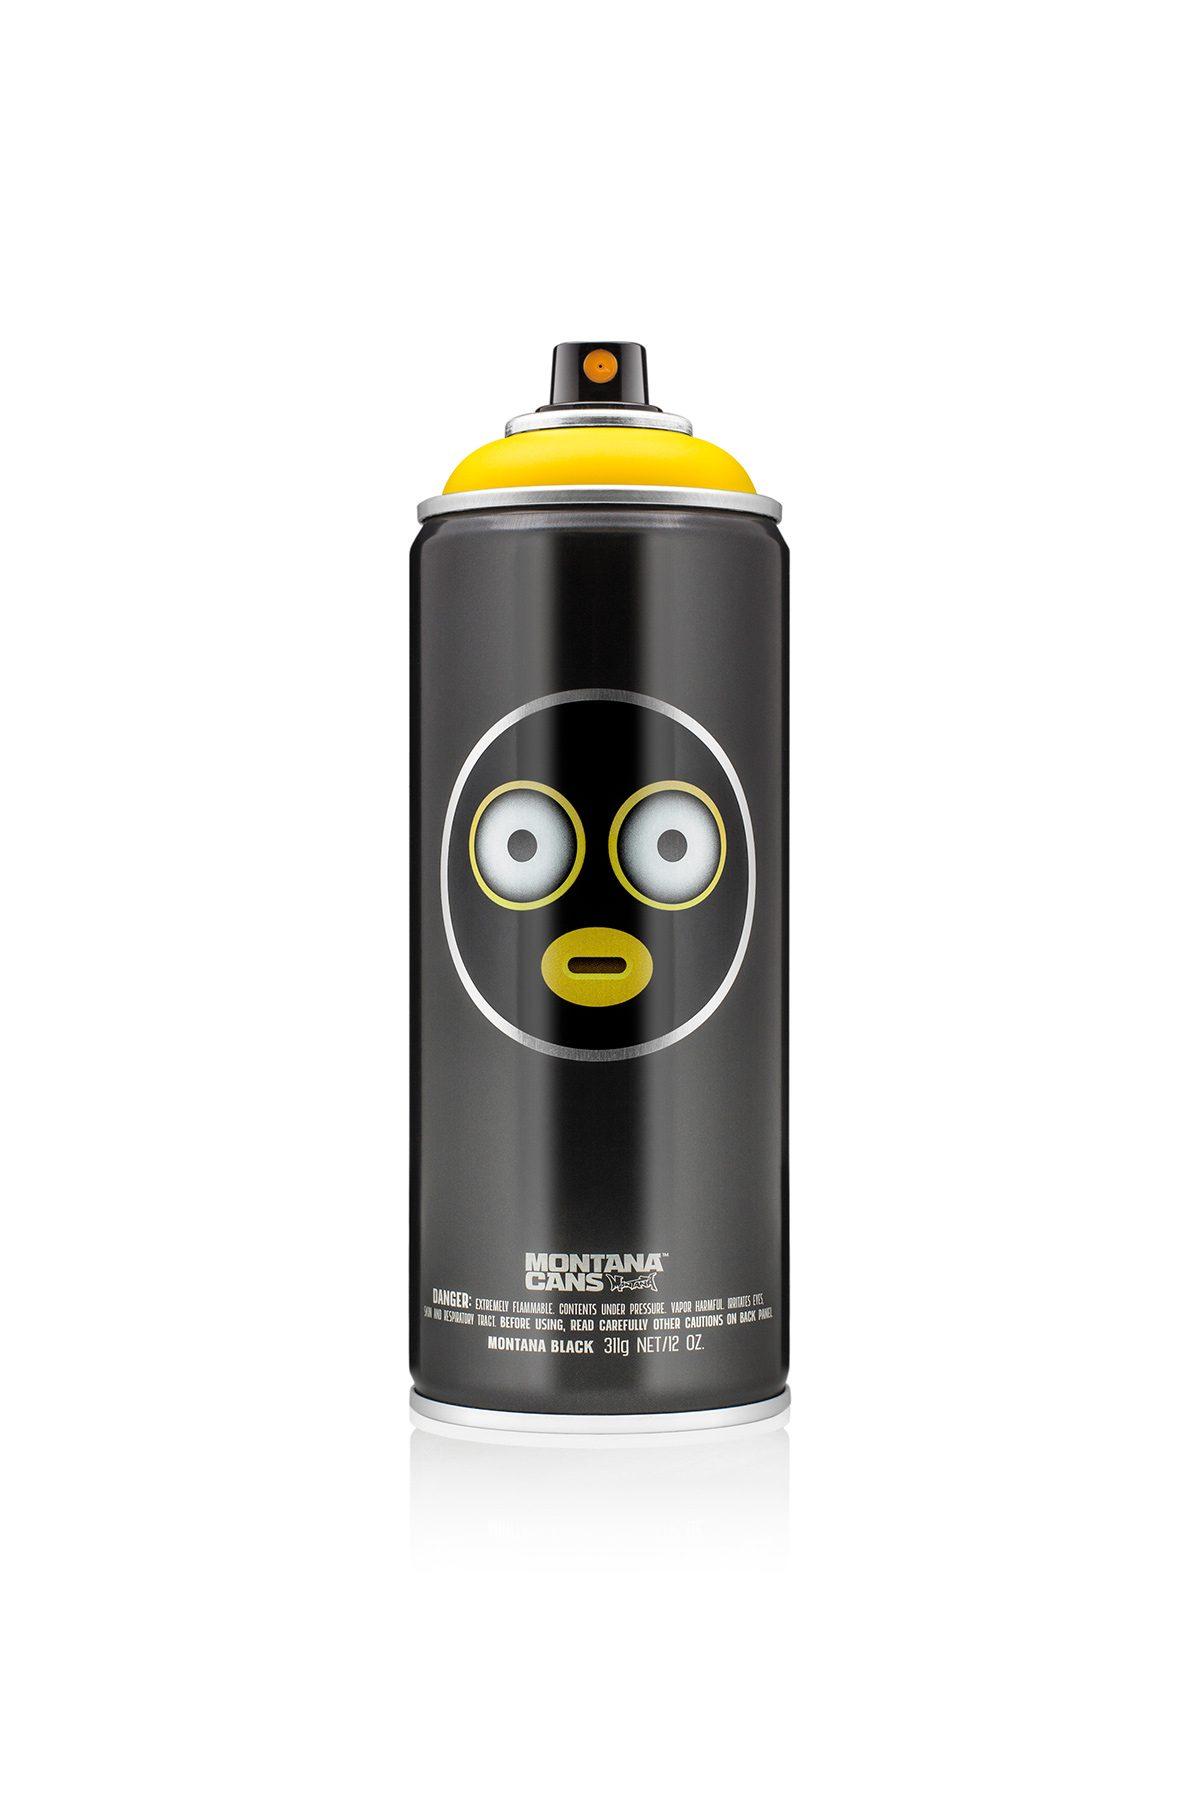 Montana BLACK #EMOJIVANDALS - Kicking Yellow - Limited Edition 400ml